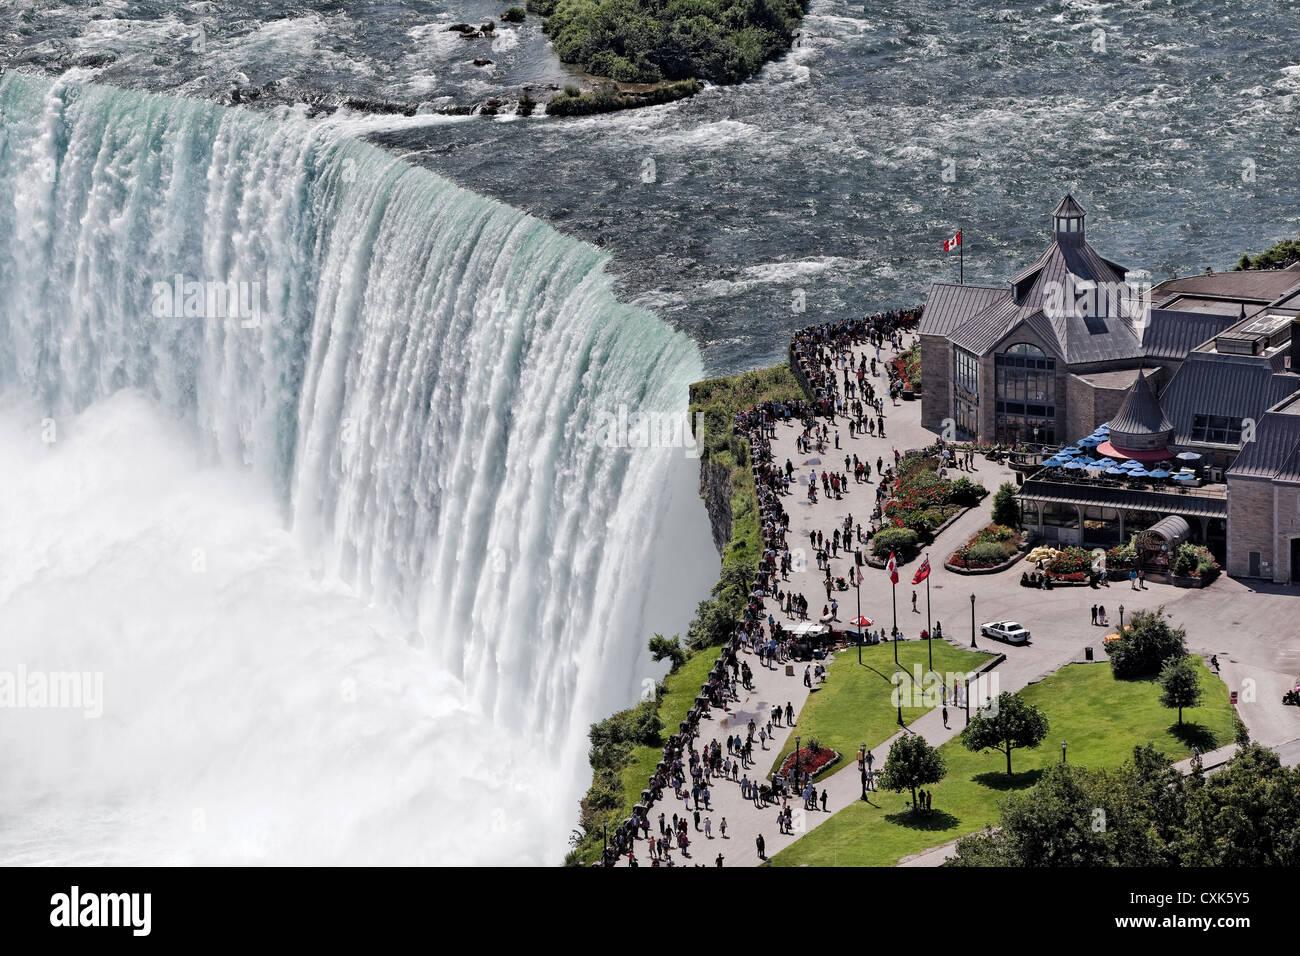 Die Horseshoe Falls in Niagara Falls, Ontario, Kanada Stockbild